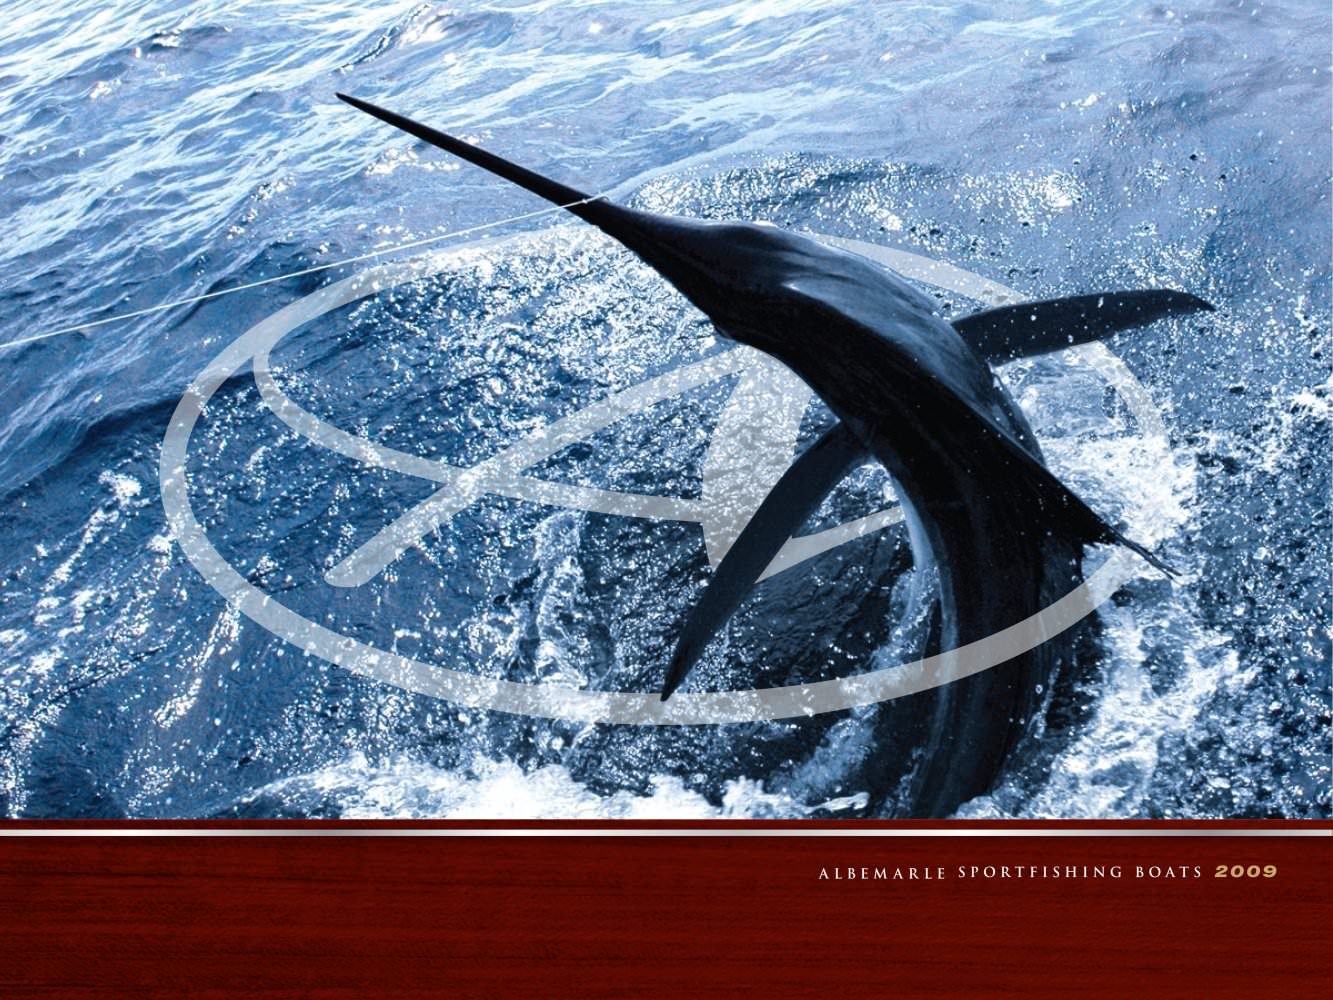 Albemarle Boats 2009 Full Line Product Brochure - Albemarle